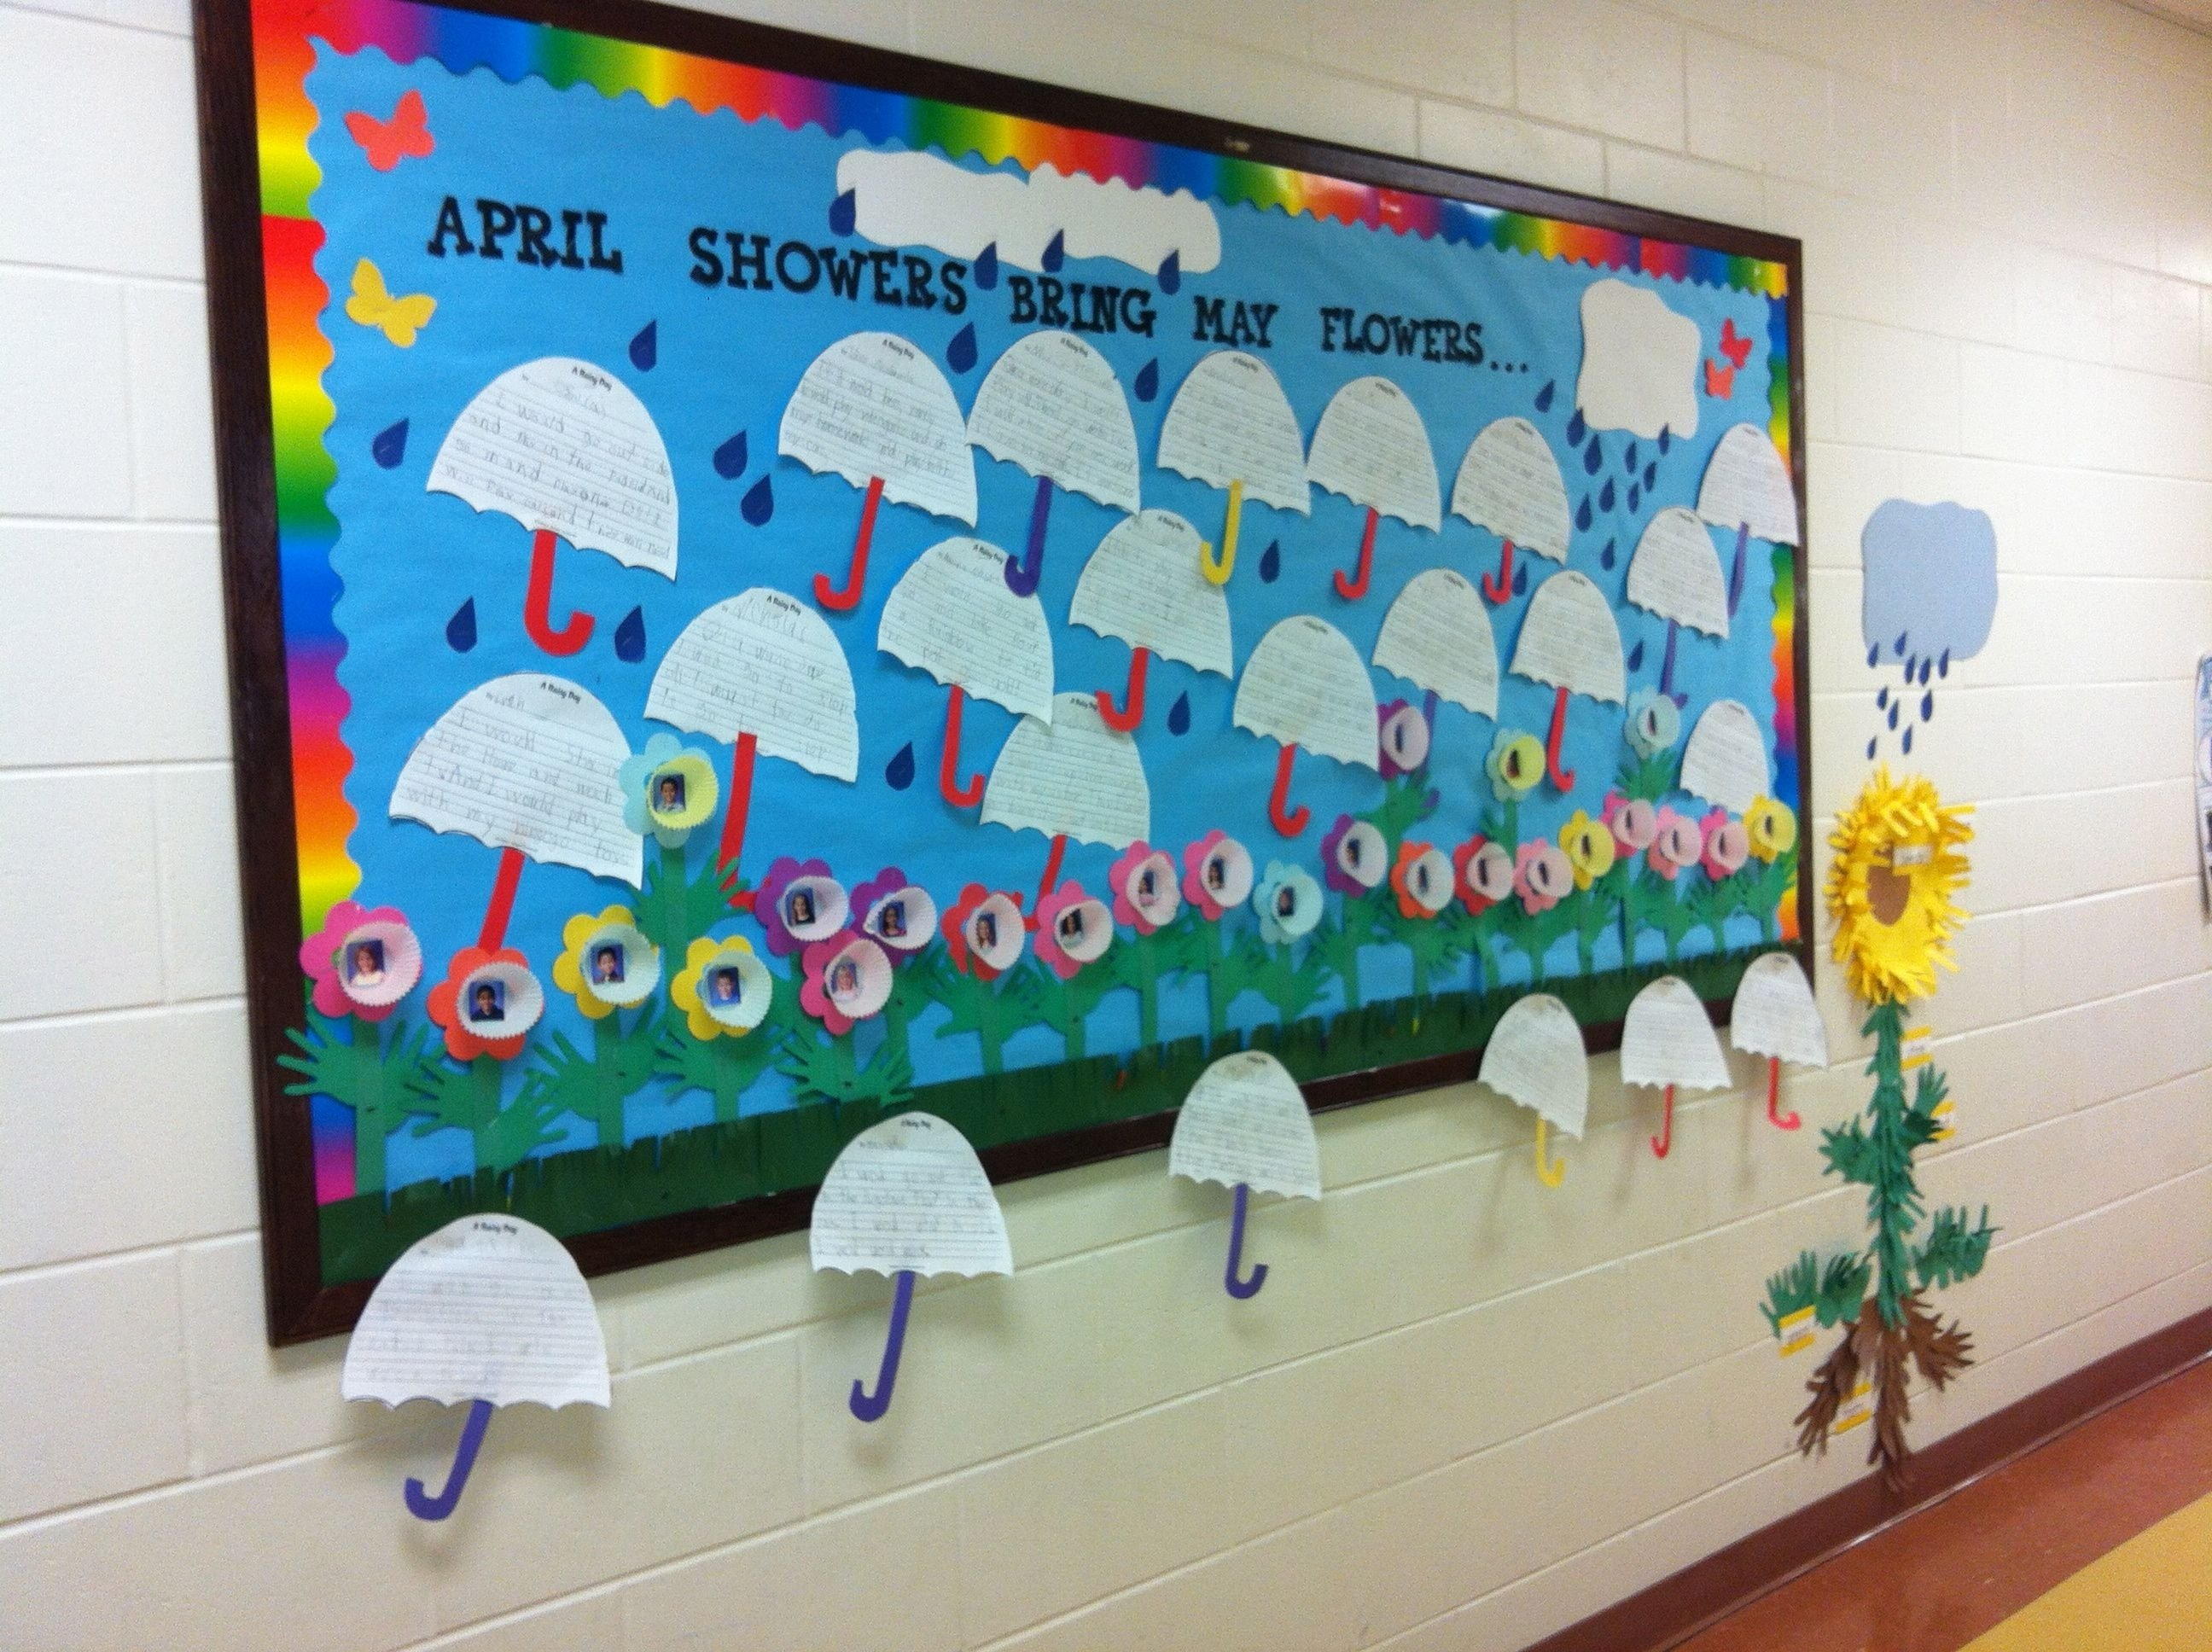 10 Attractive April Showers Bulletin Board Ideas april showers bring may flowers bulletin boards pinterest 2021